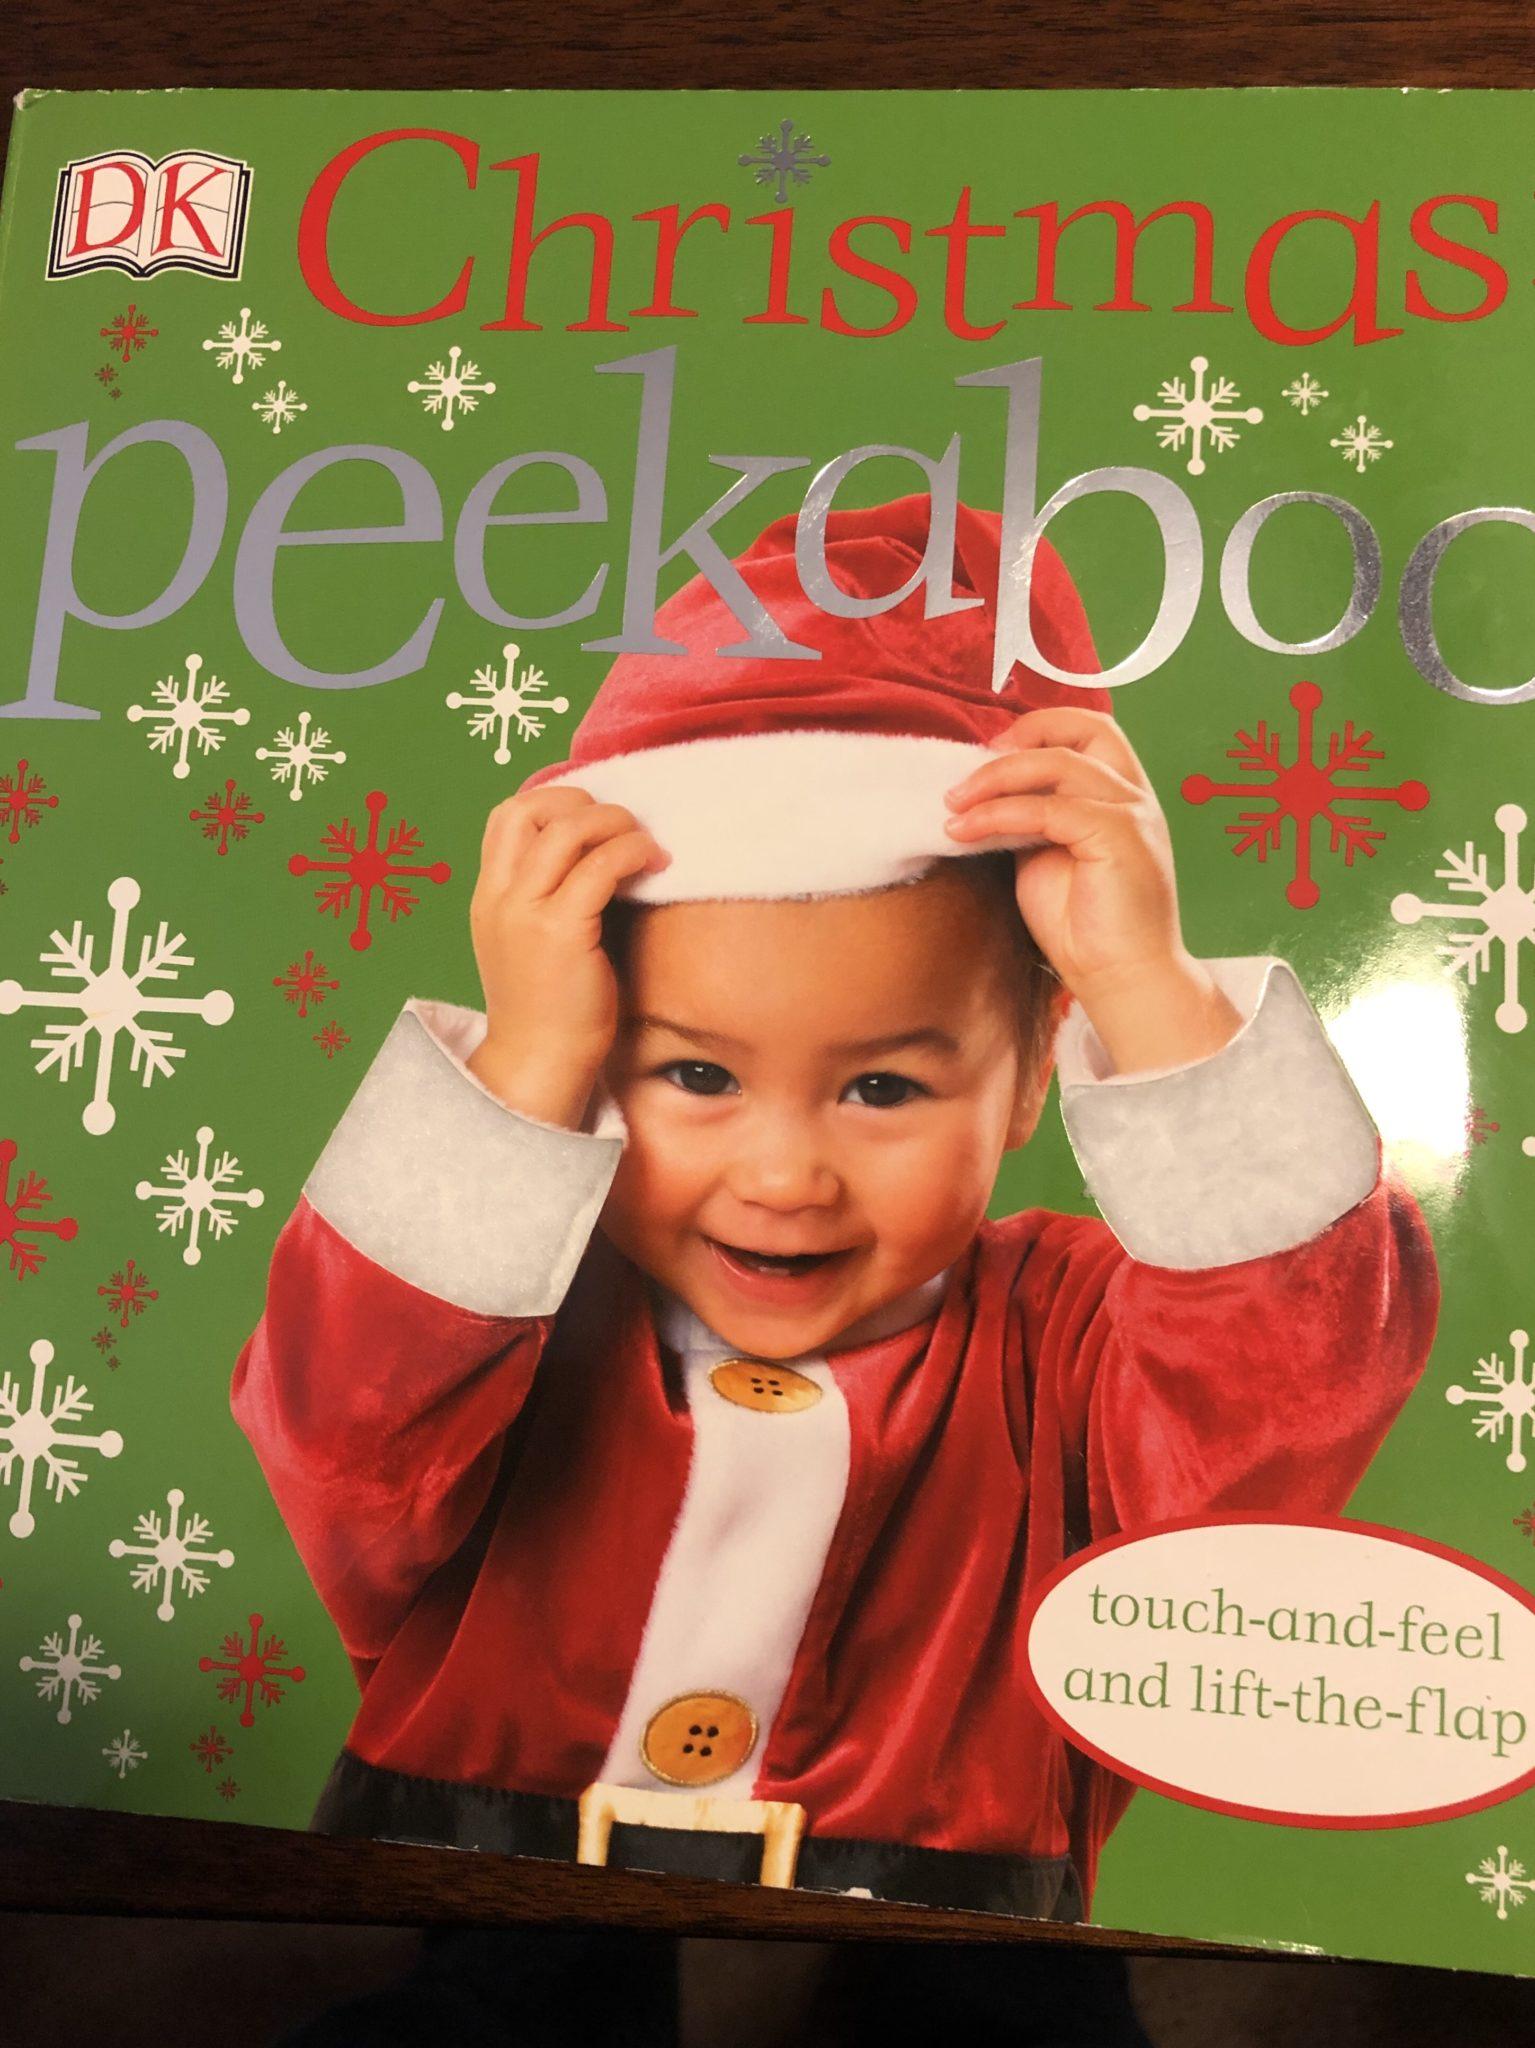 Peekaboo Christmas book cover.